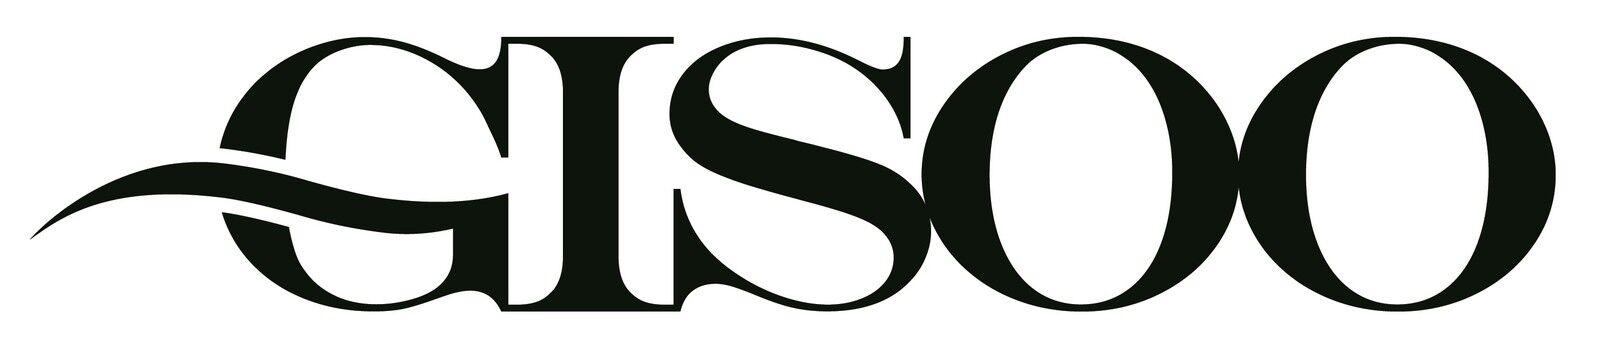 Gisoo Hair Products